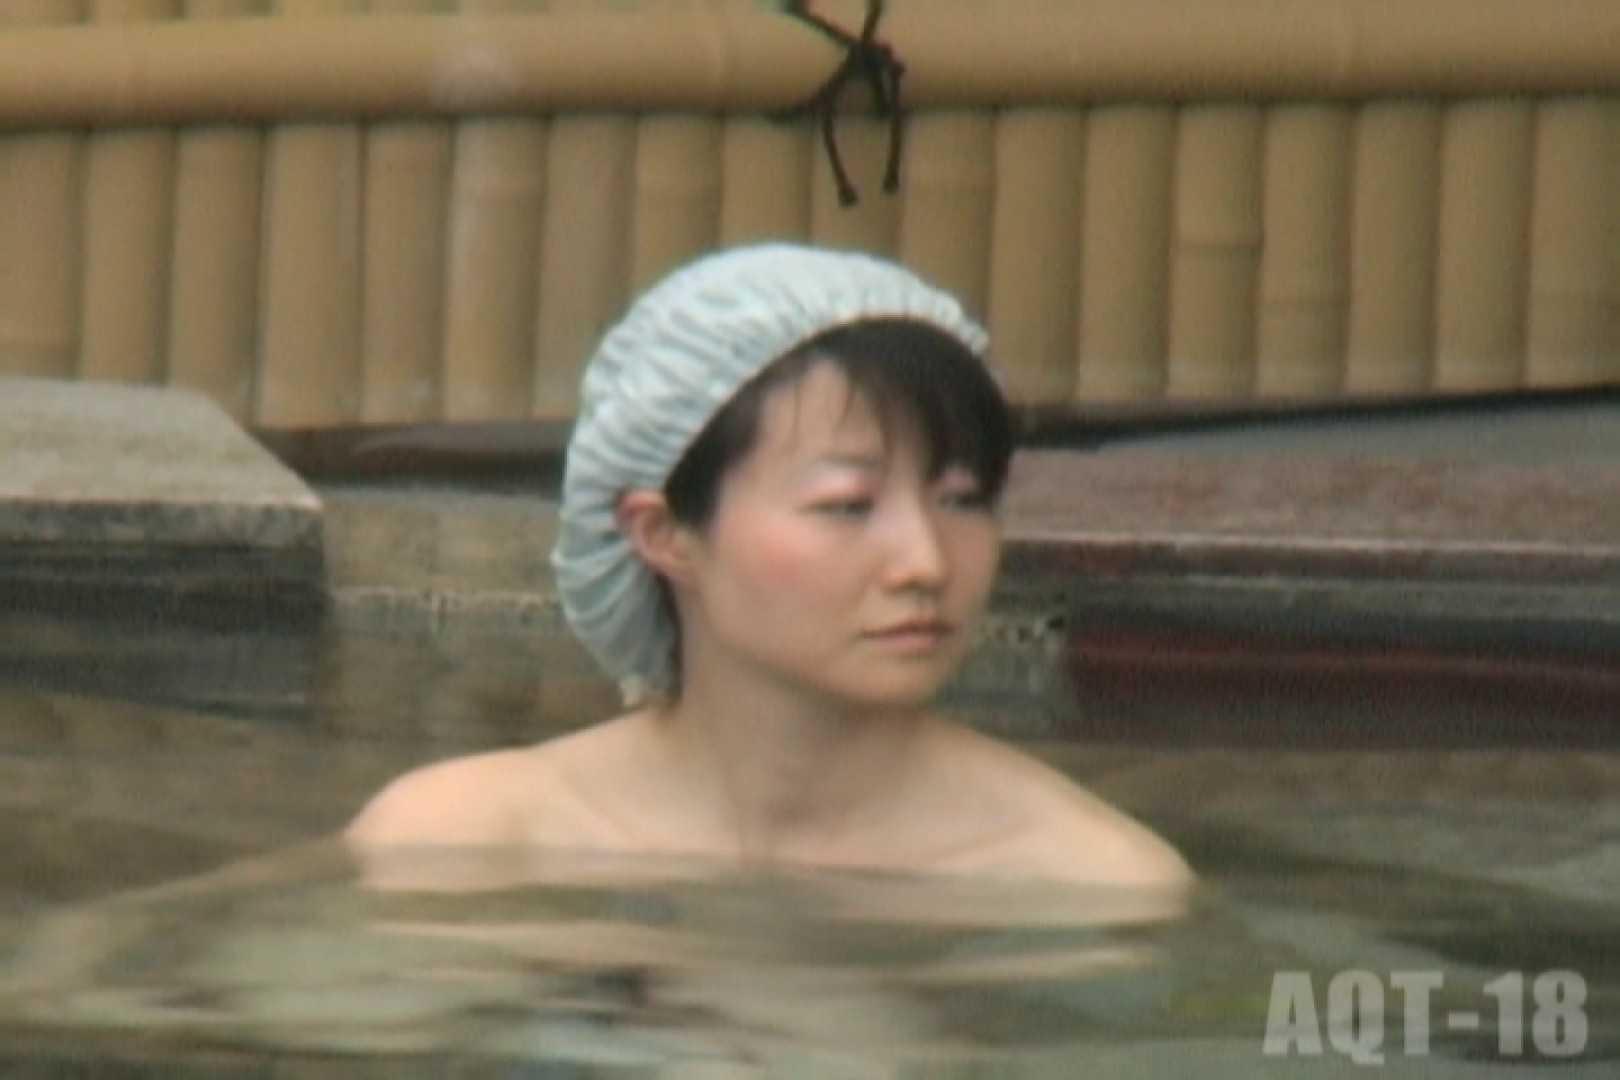 Aquaな露天風呂Vol.864 OLセックス  68画像 39